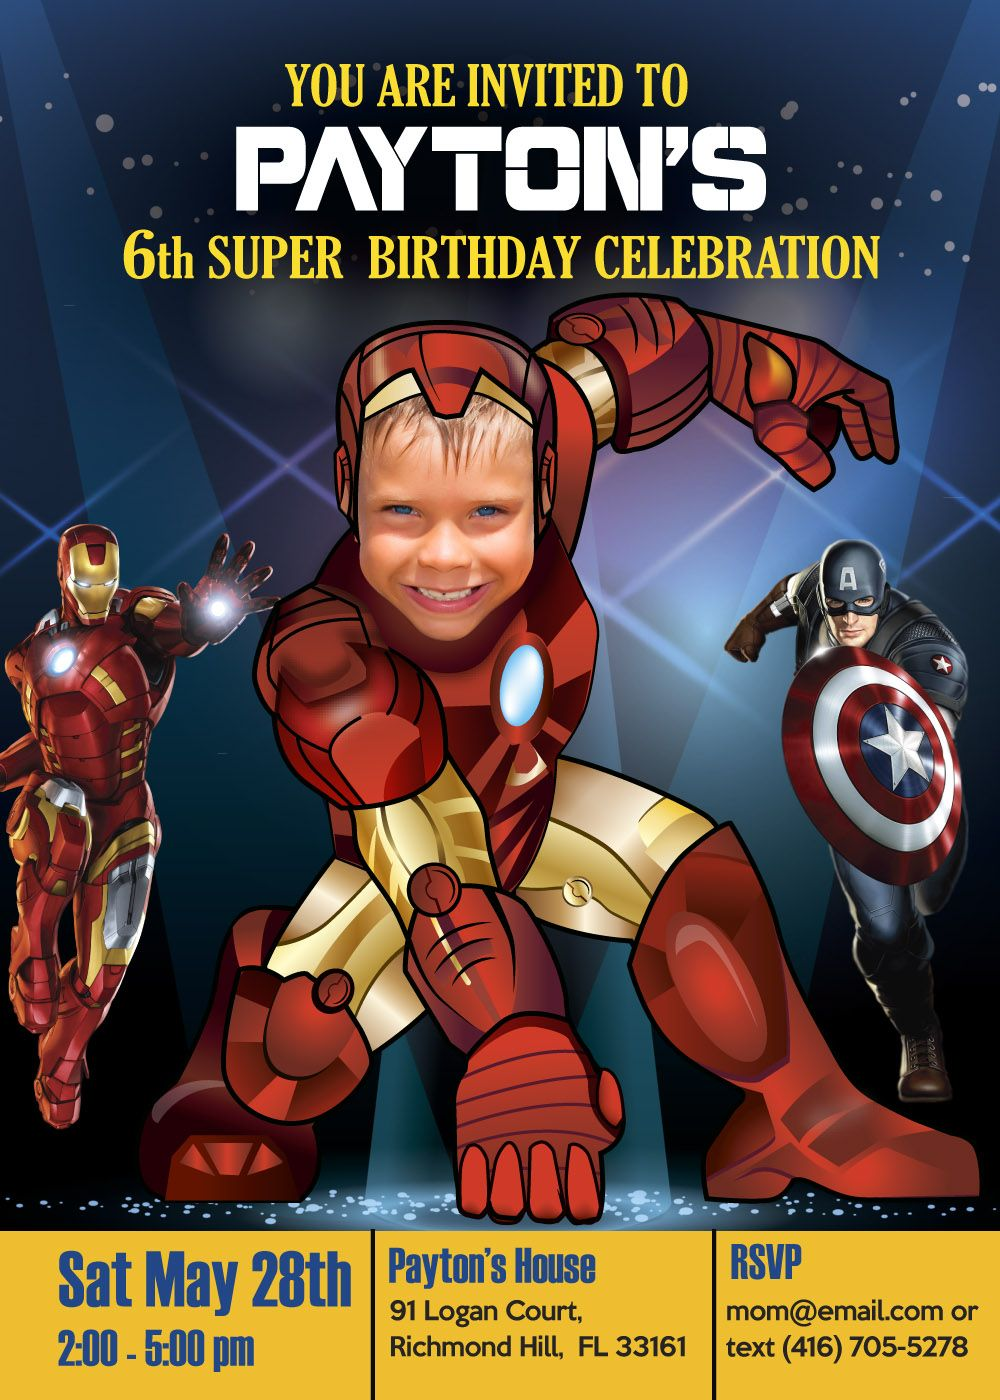 Turn your boy into his favorite Super Hero IRONMAN! Ironman ...